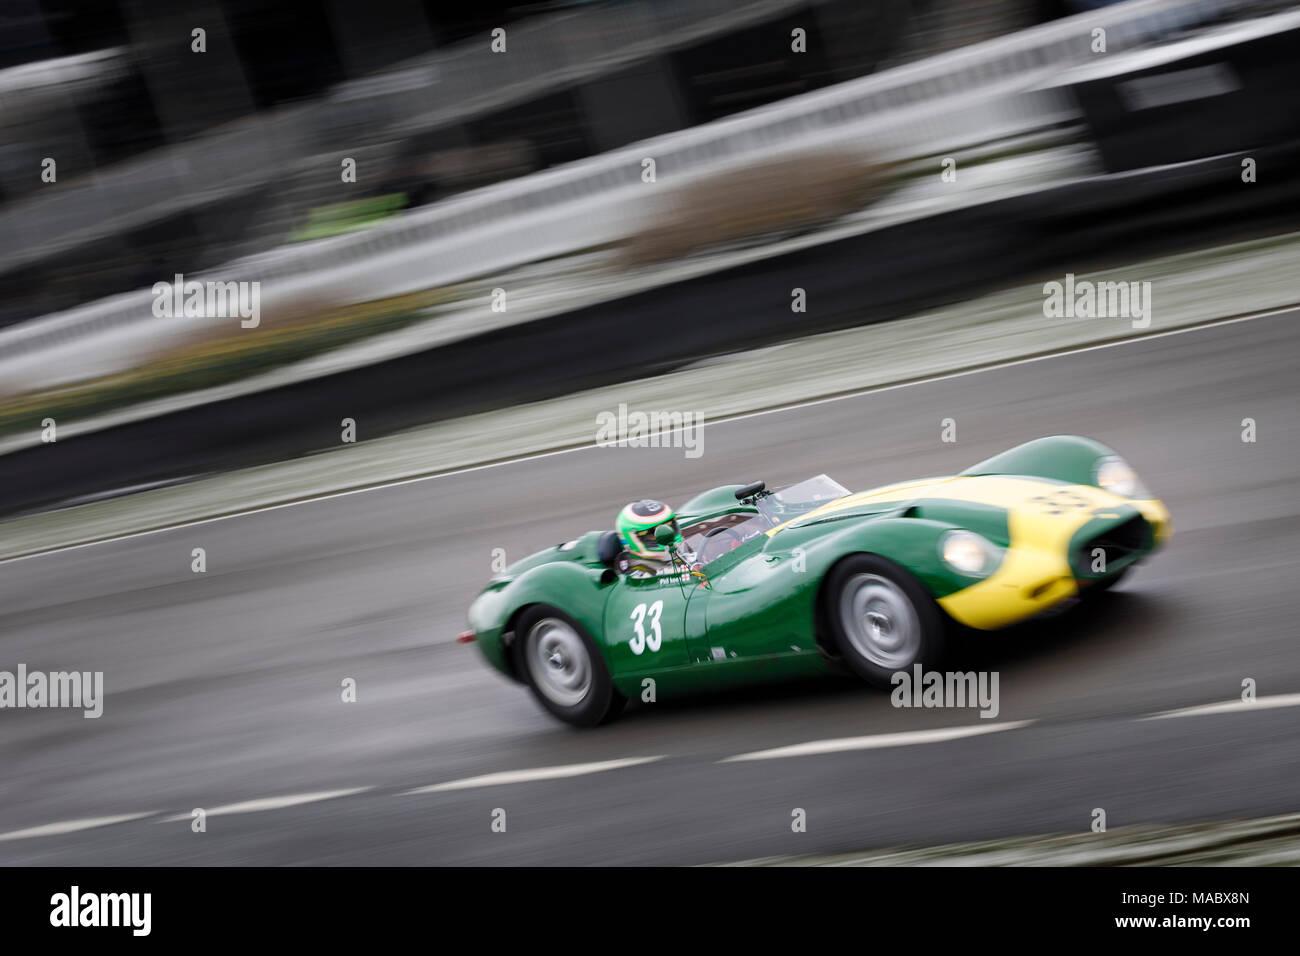 "1959 Lister-Jaguar ""KNORRIGEN"" mit Fahrer Jon Minshaw während der salvadori Cup Rennen am Goodwood 76th Mitgliederversammlung, Sussex, UK. Stockbild"